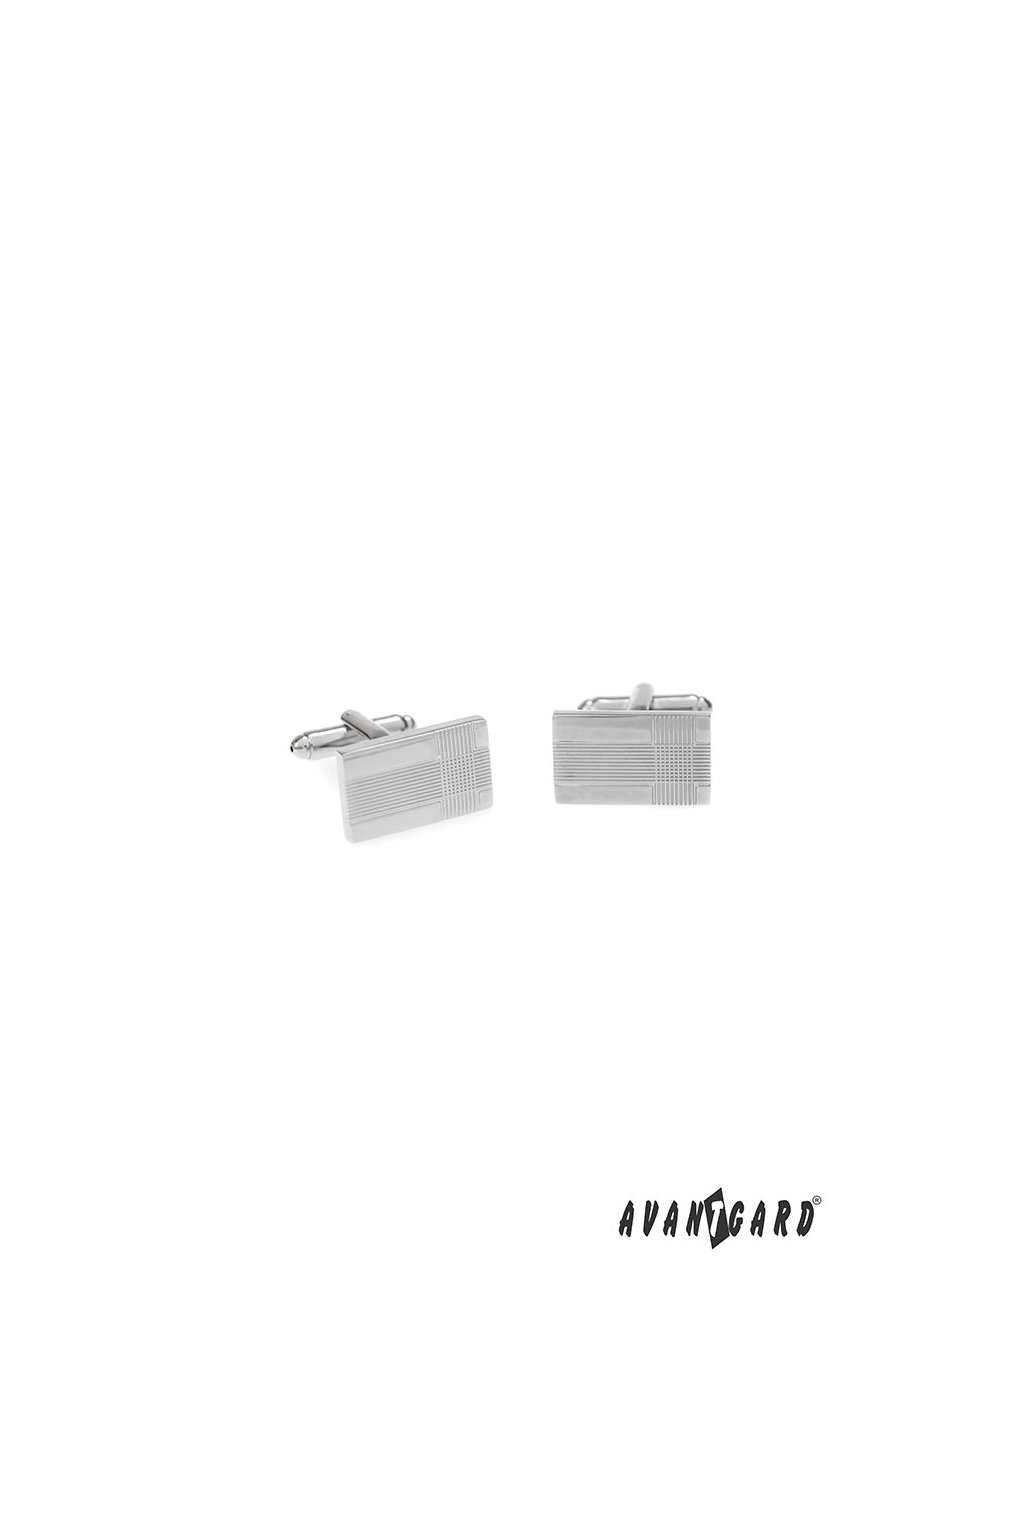 Manžetové knoflíčky AVANTGARD PREMIUM stříbrná lesk 573 - 20709